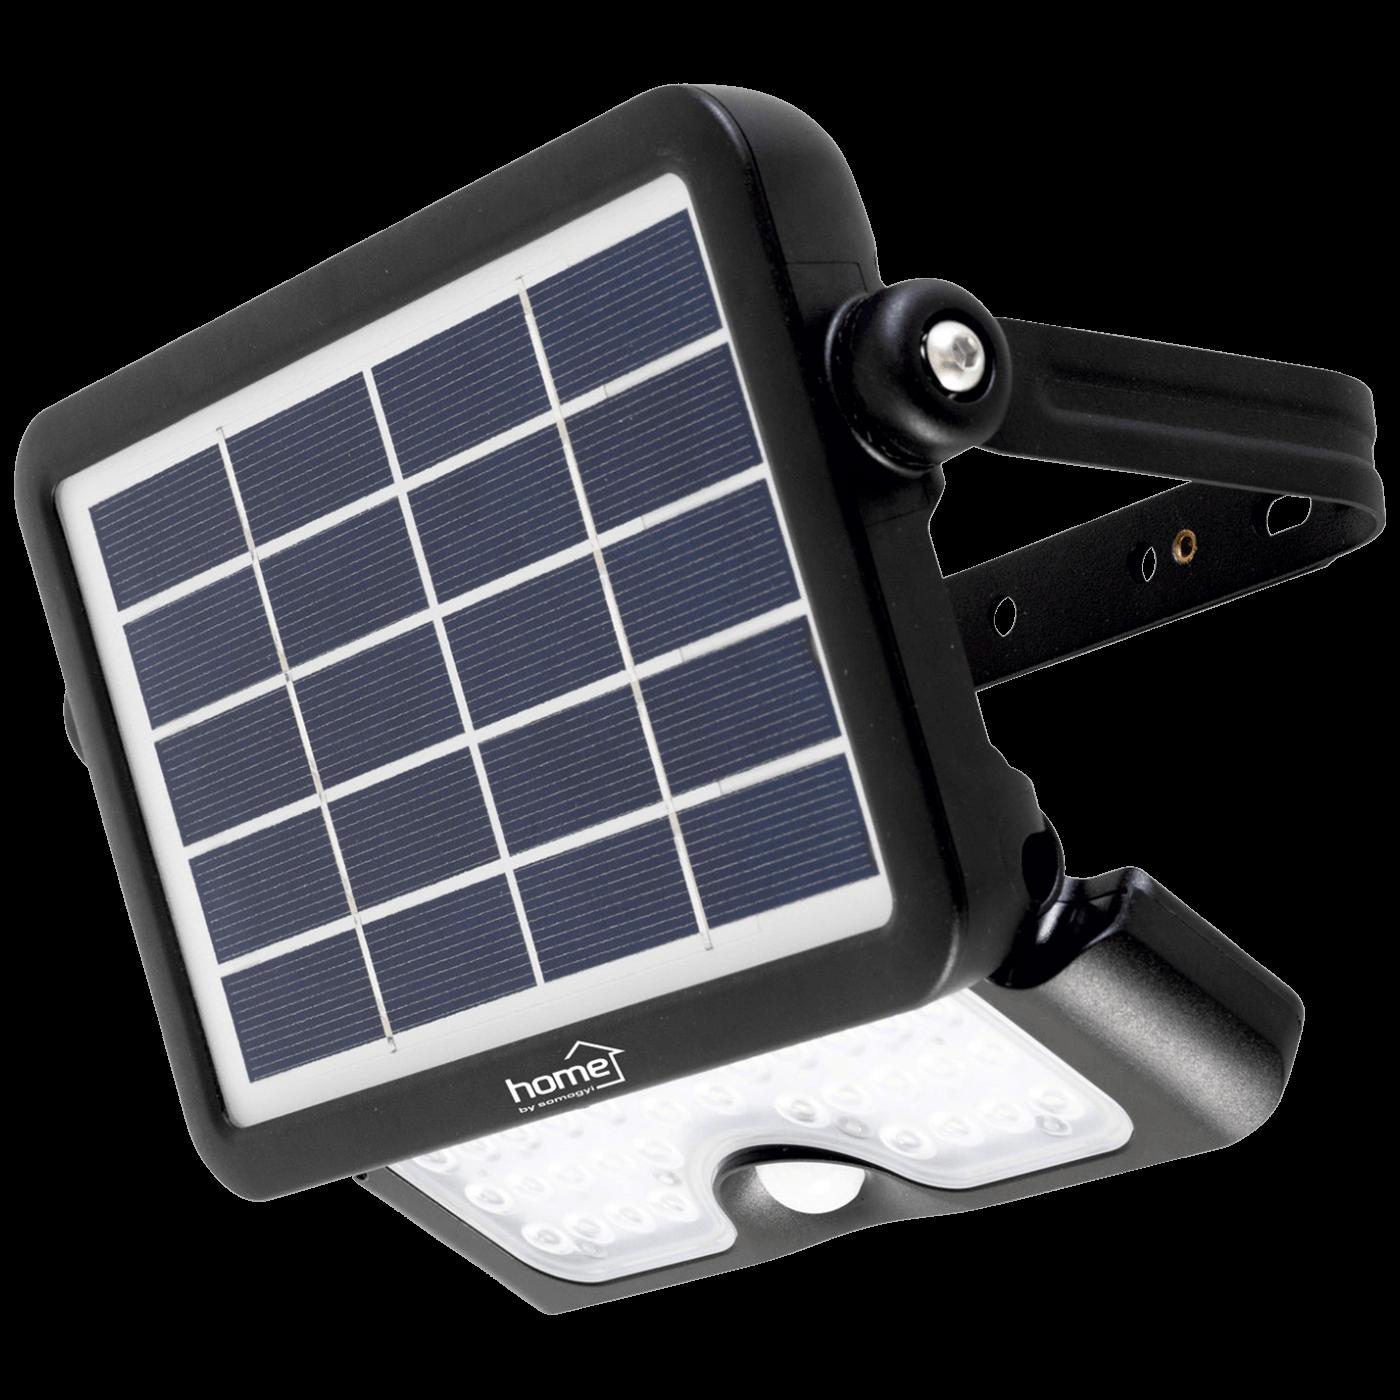 Reflektor LED 5W sa solarnim panelom, detekcija pokreta